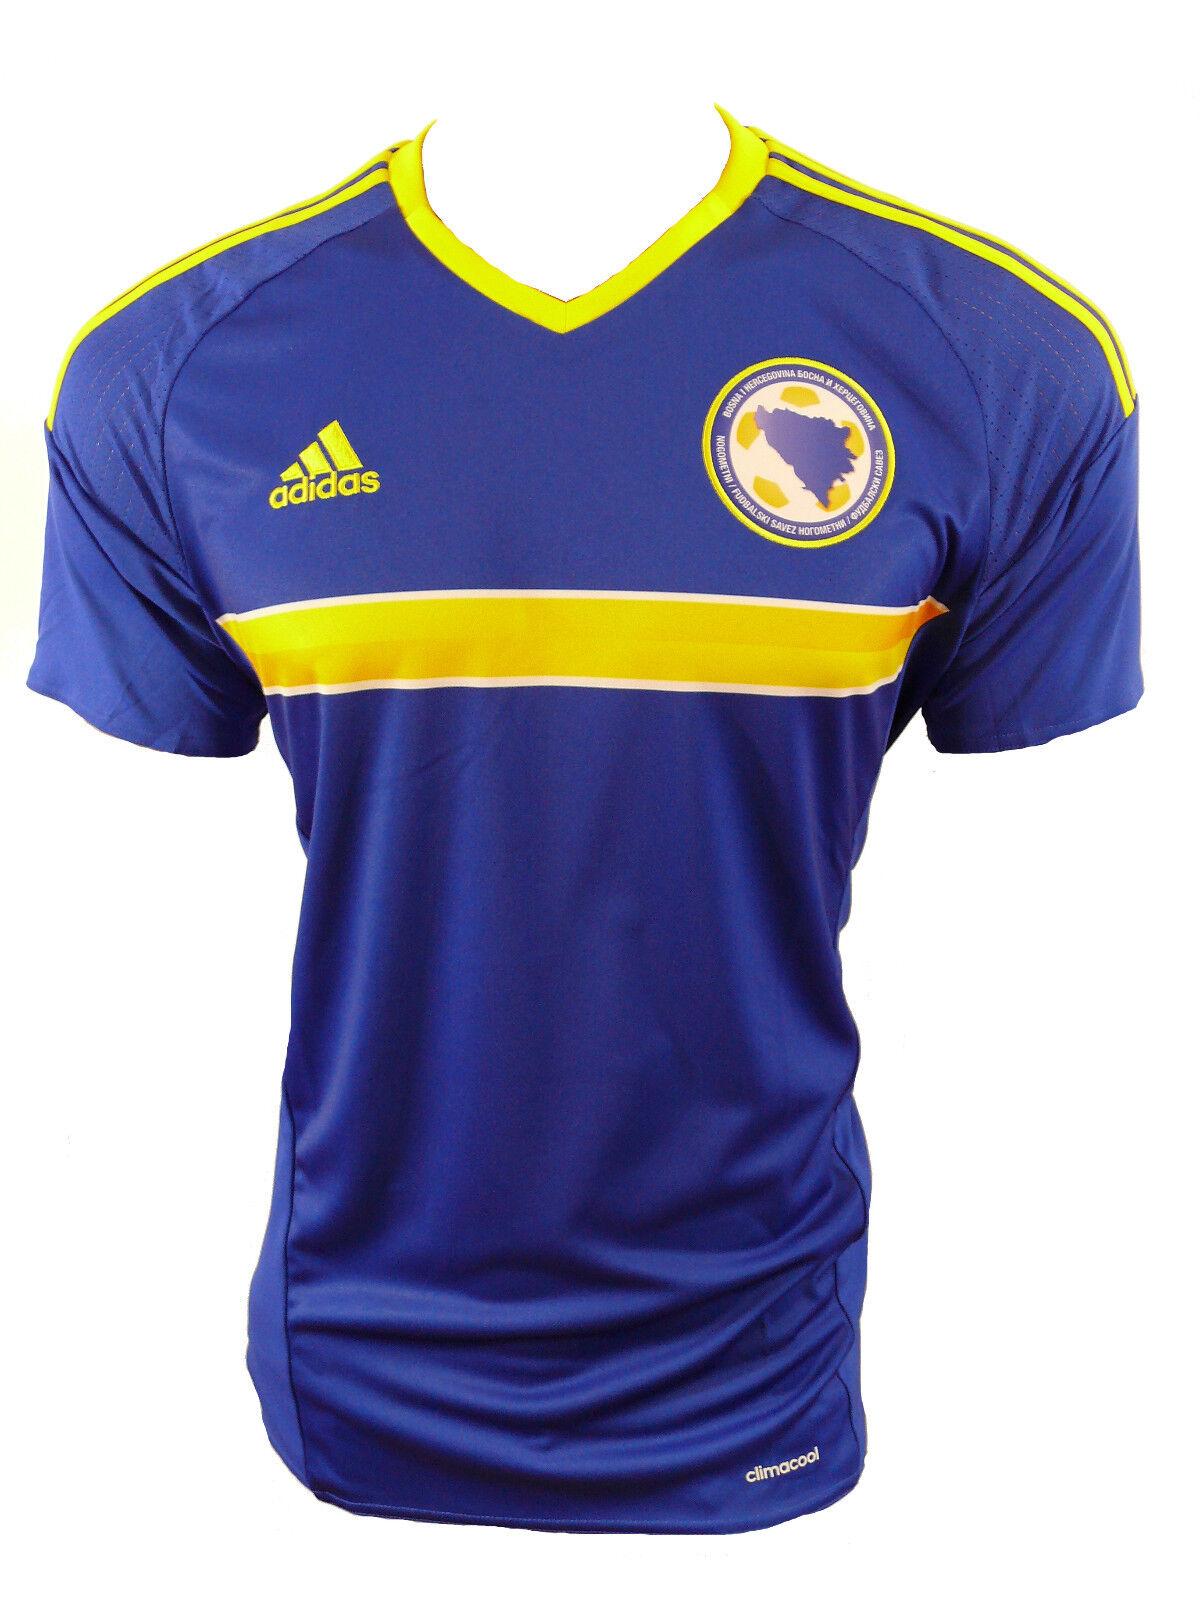 Adidas Bosnia Herzegovina jersey size L